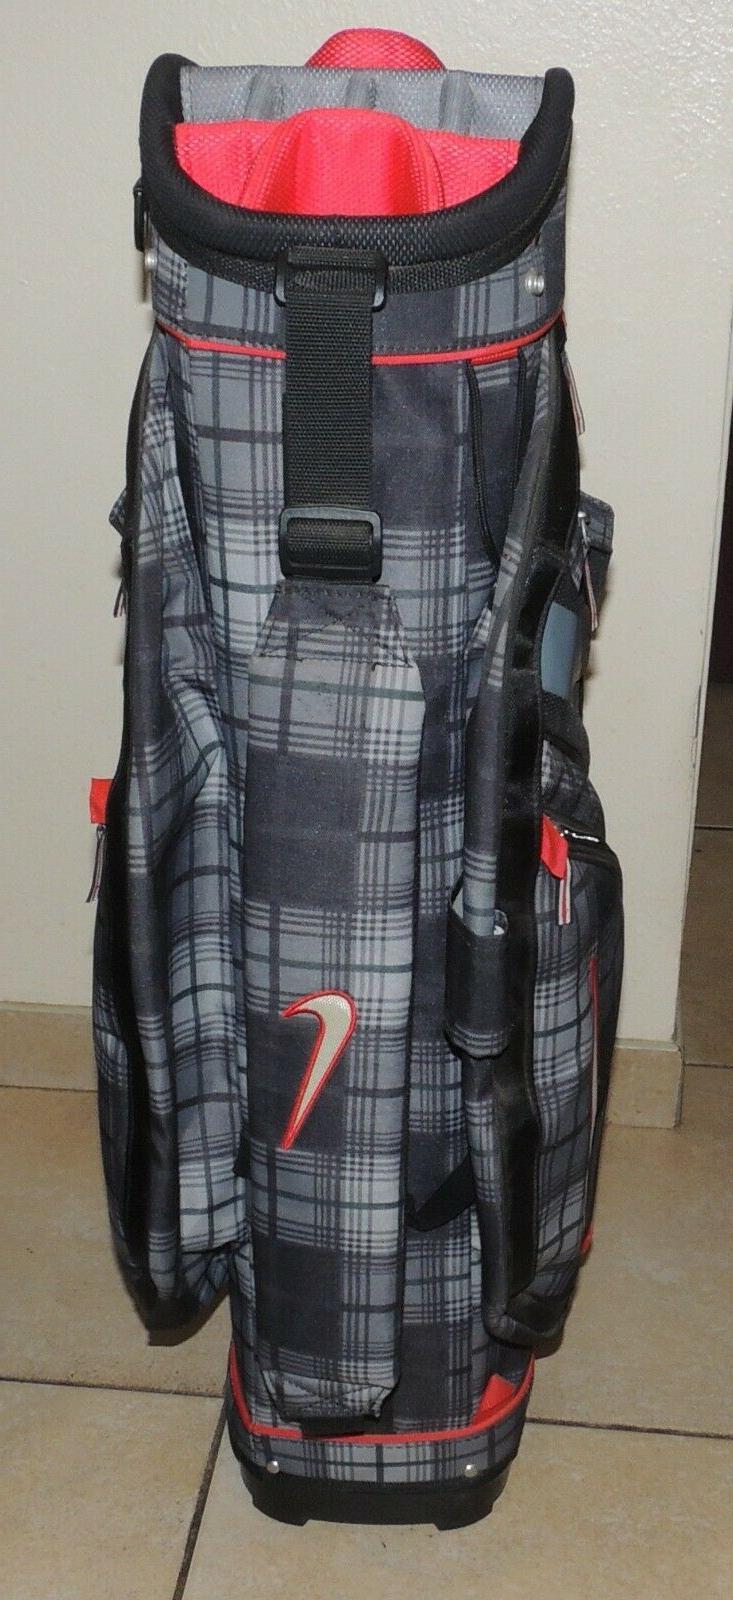 *NEW* Nike II Club Blk/Grey/Plaid Bag